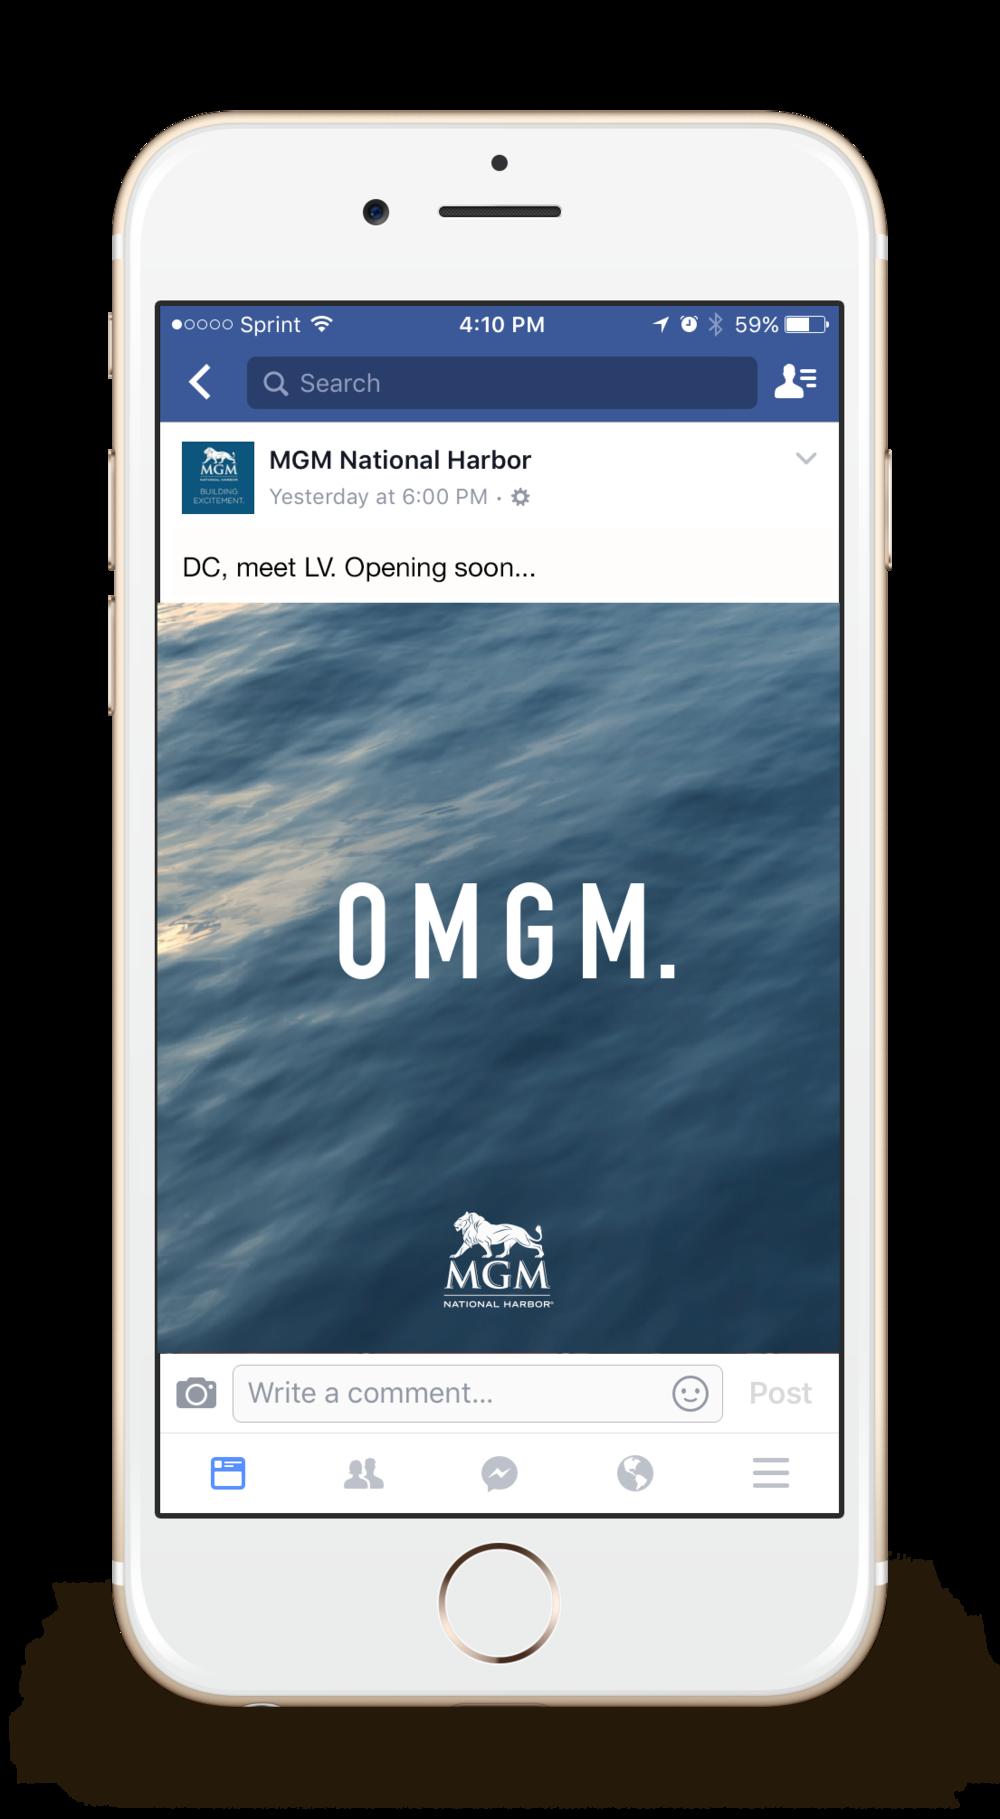 MGM_NatHarbor-FB-2-v2.png